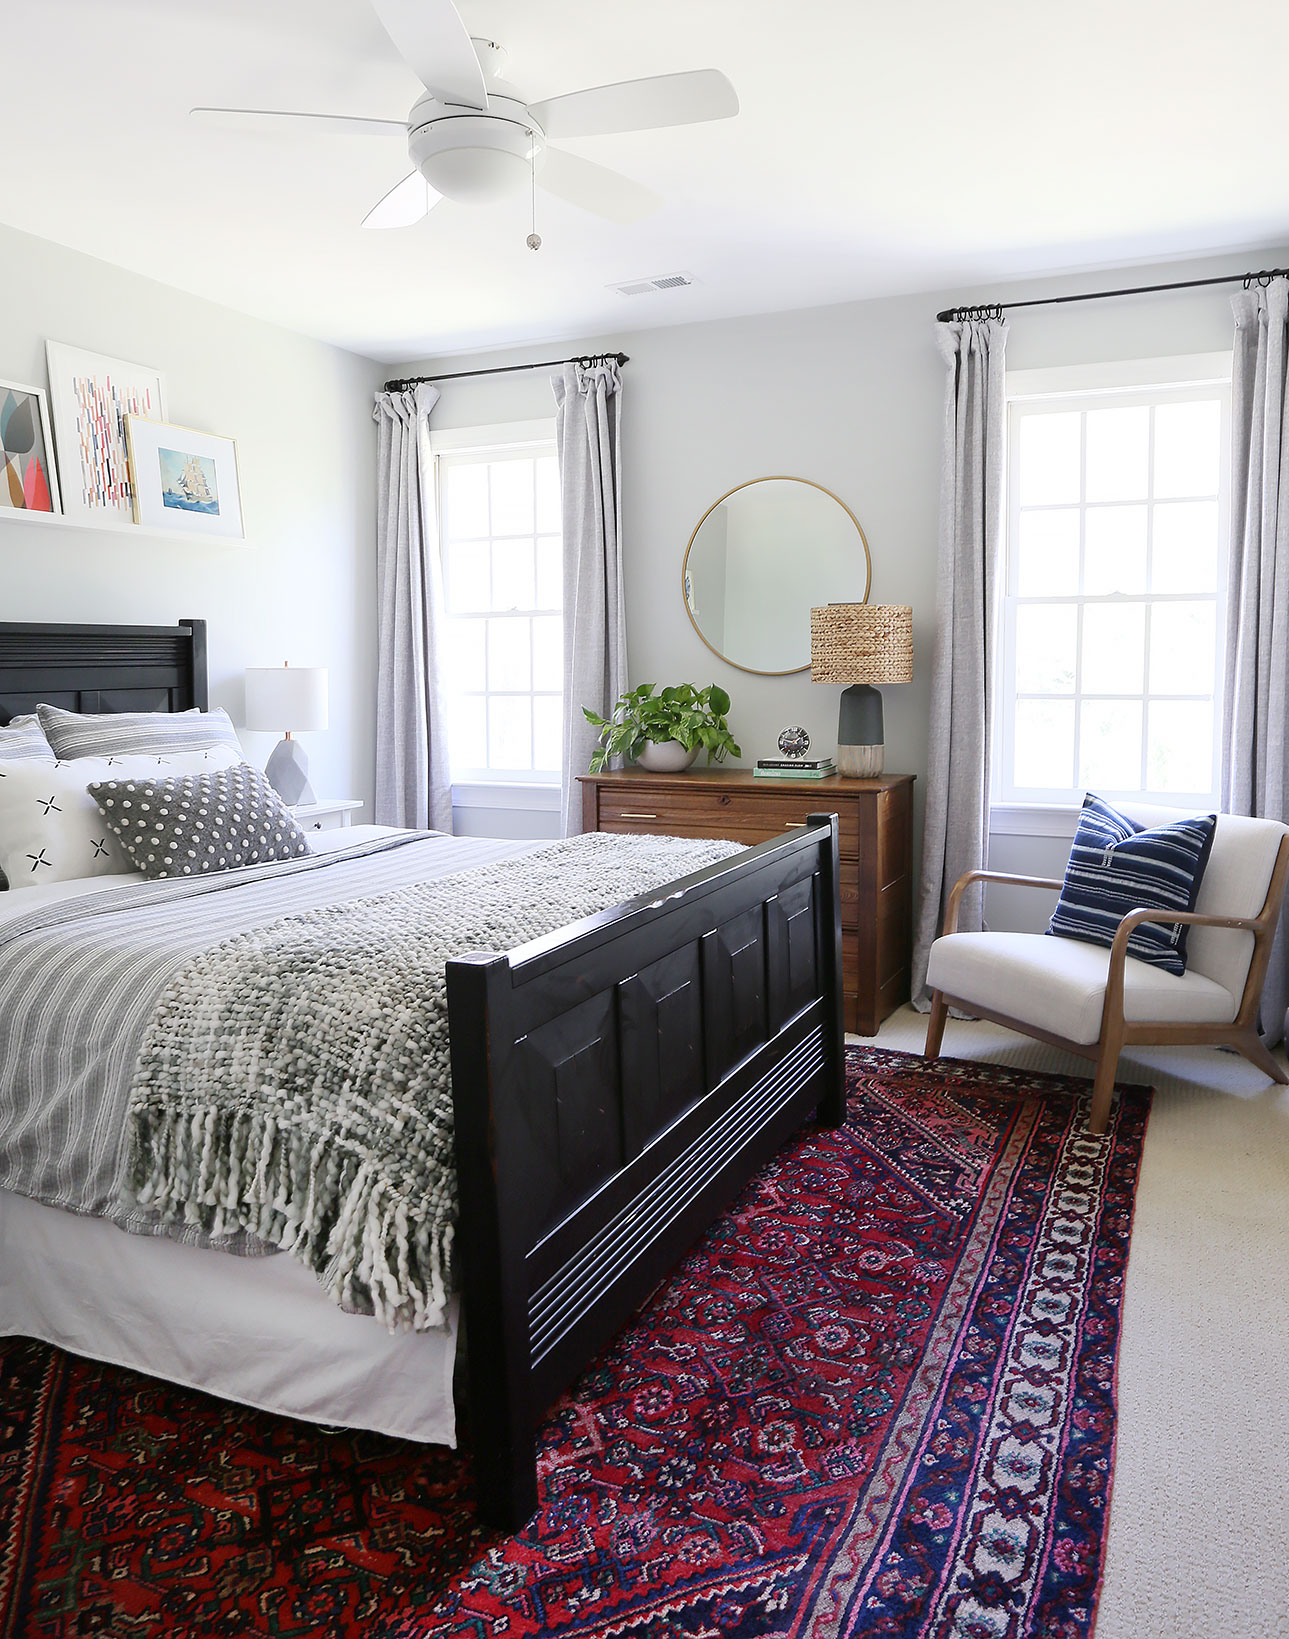 bedding   /   throw   /   lumbar pillow   /   curtain panels   /   mirror   /   chair   /   table lamp base   /   lamp shade   /   blue striped pillow